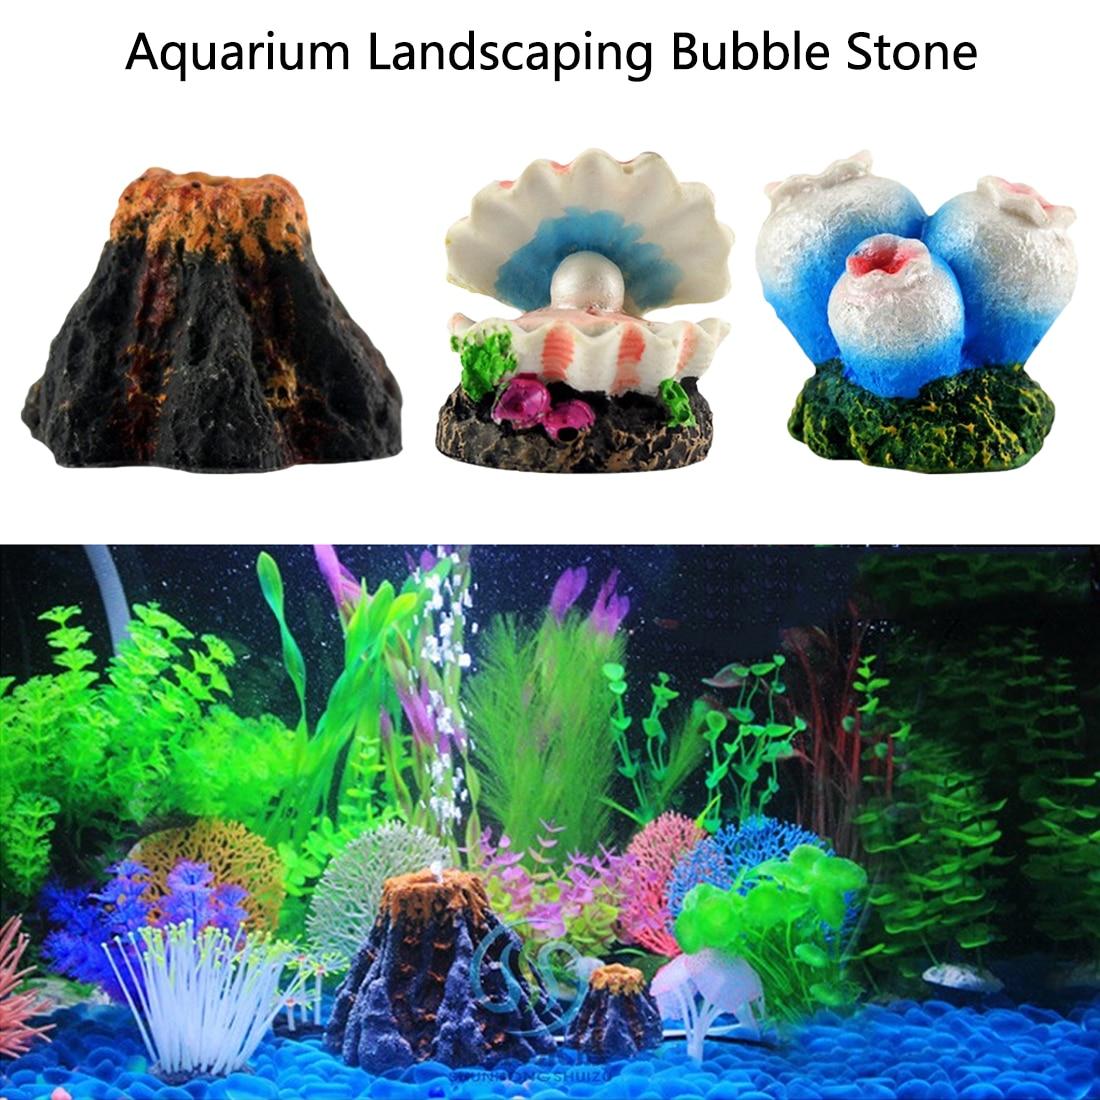 60 To 100-Gal Aquarium Air Pump Pet Supplies Fish Tank Underwater Bubbles Home